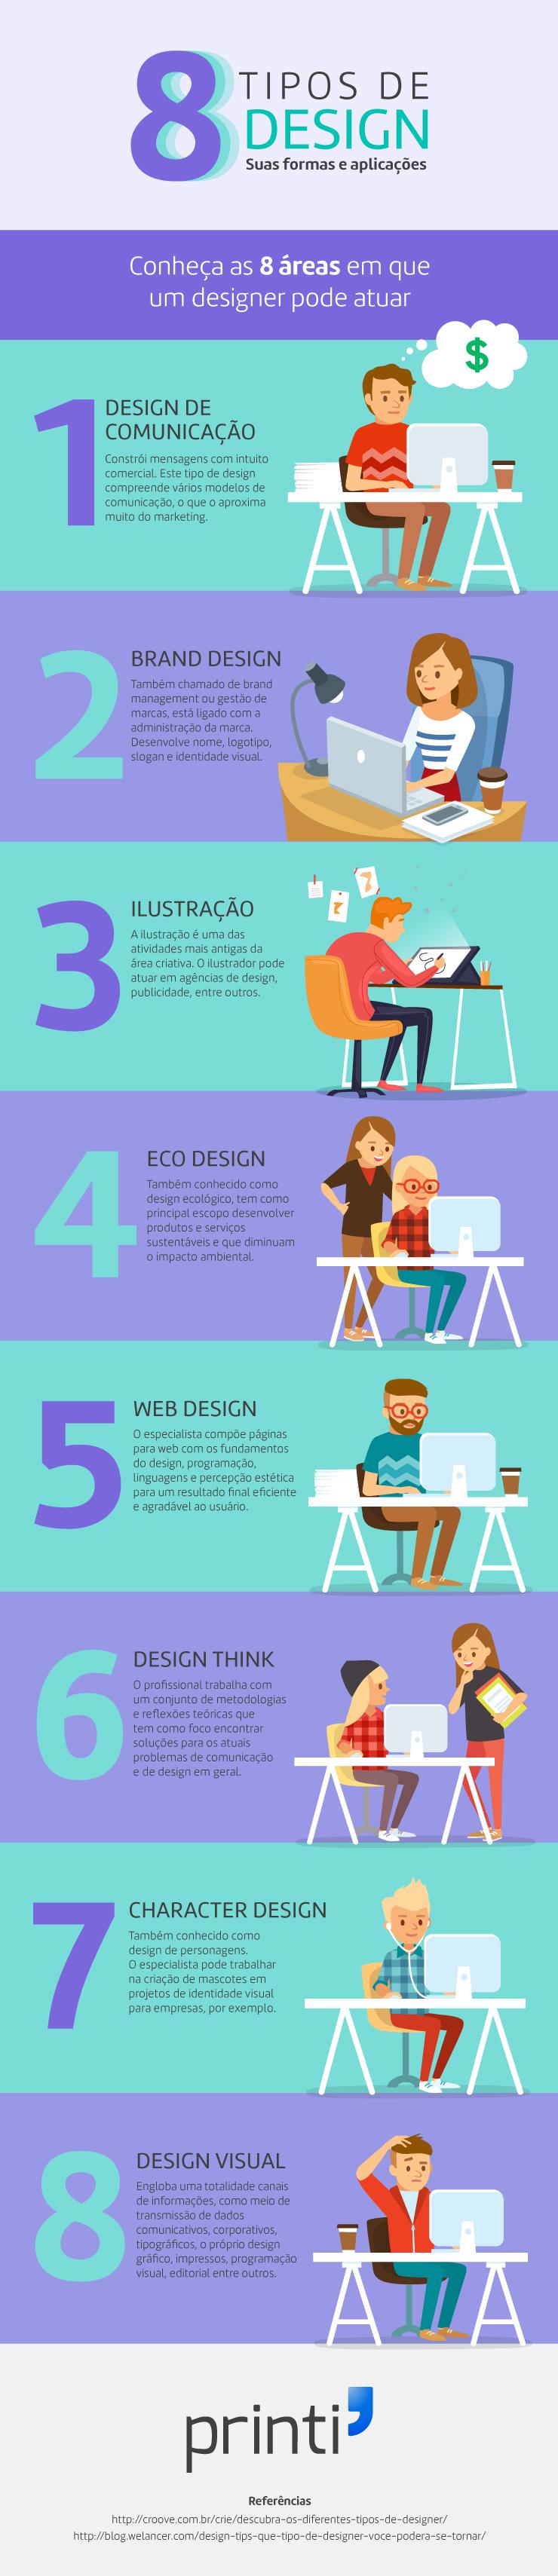 tipos de design